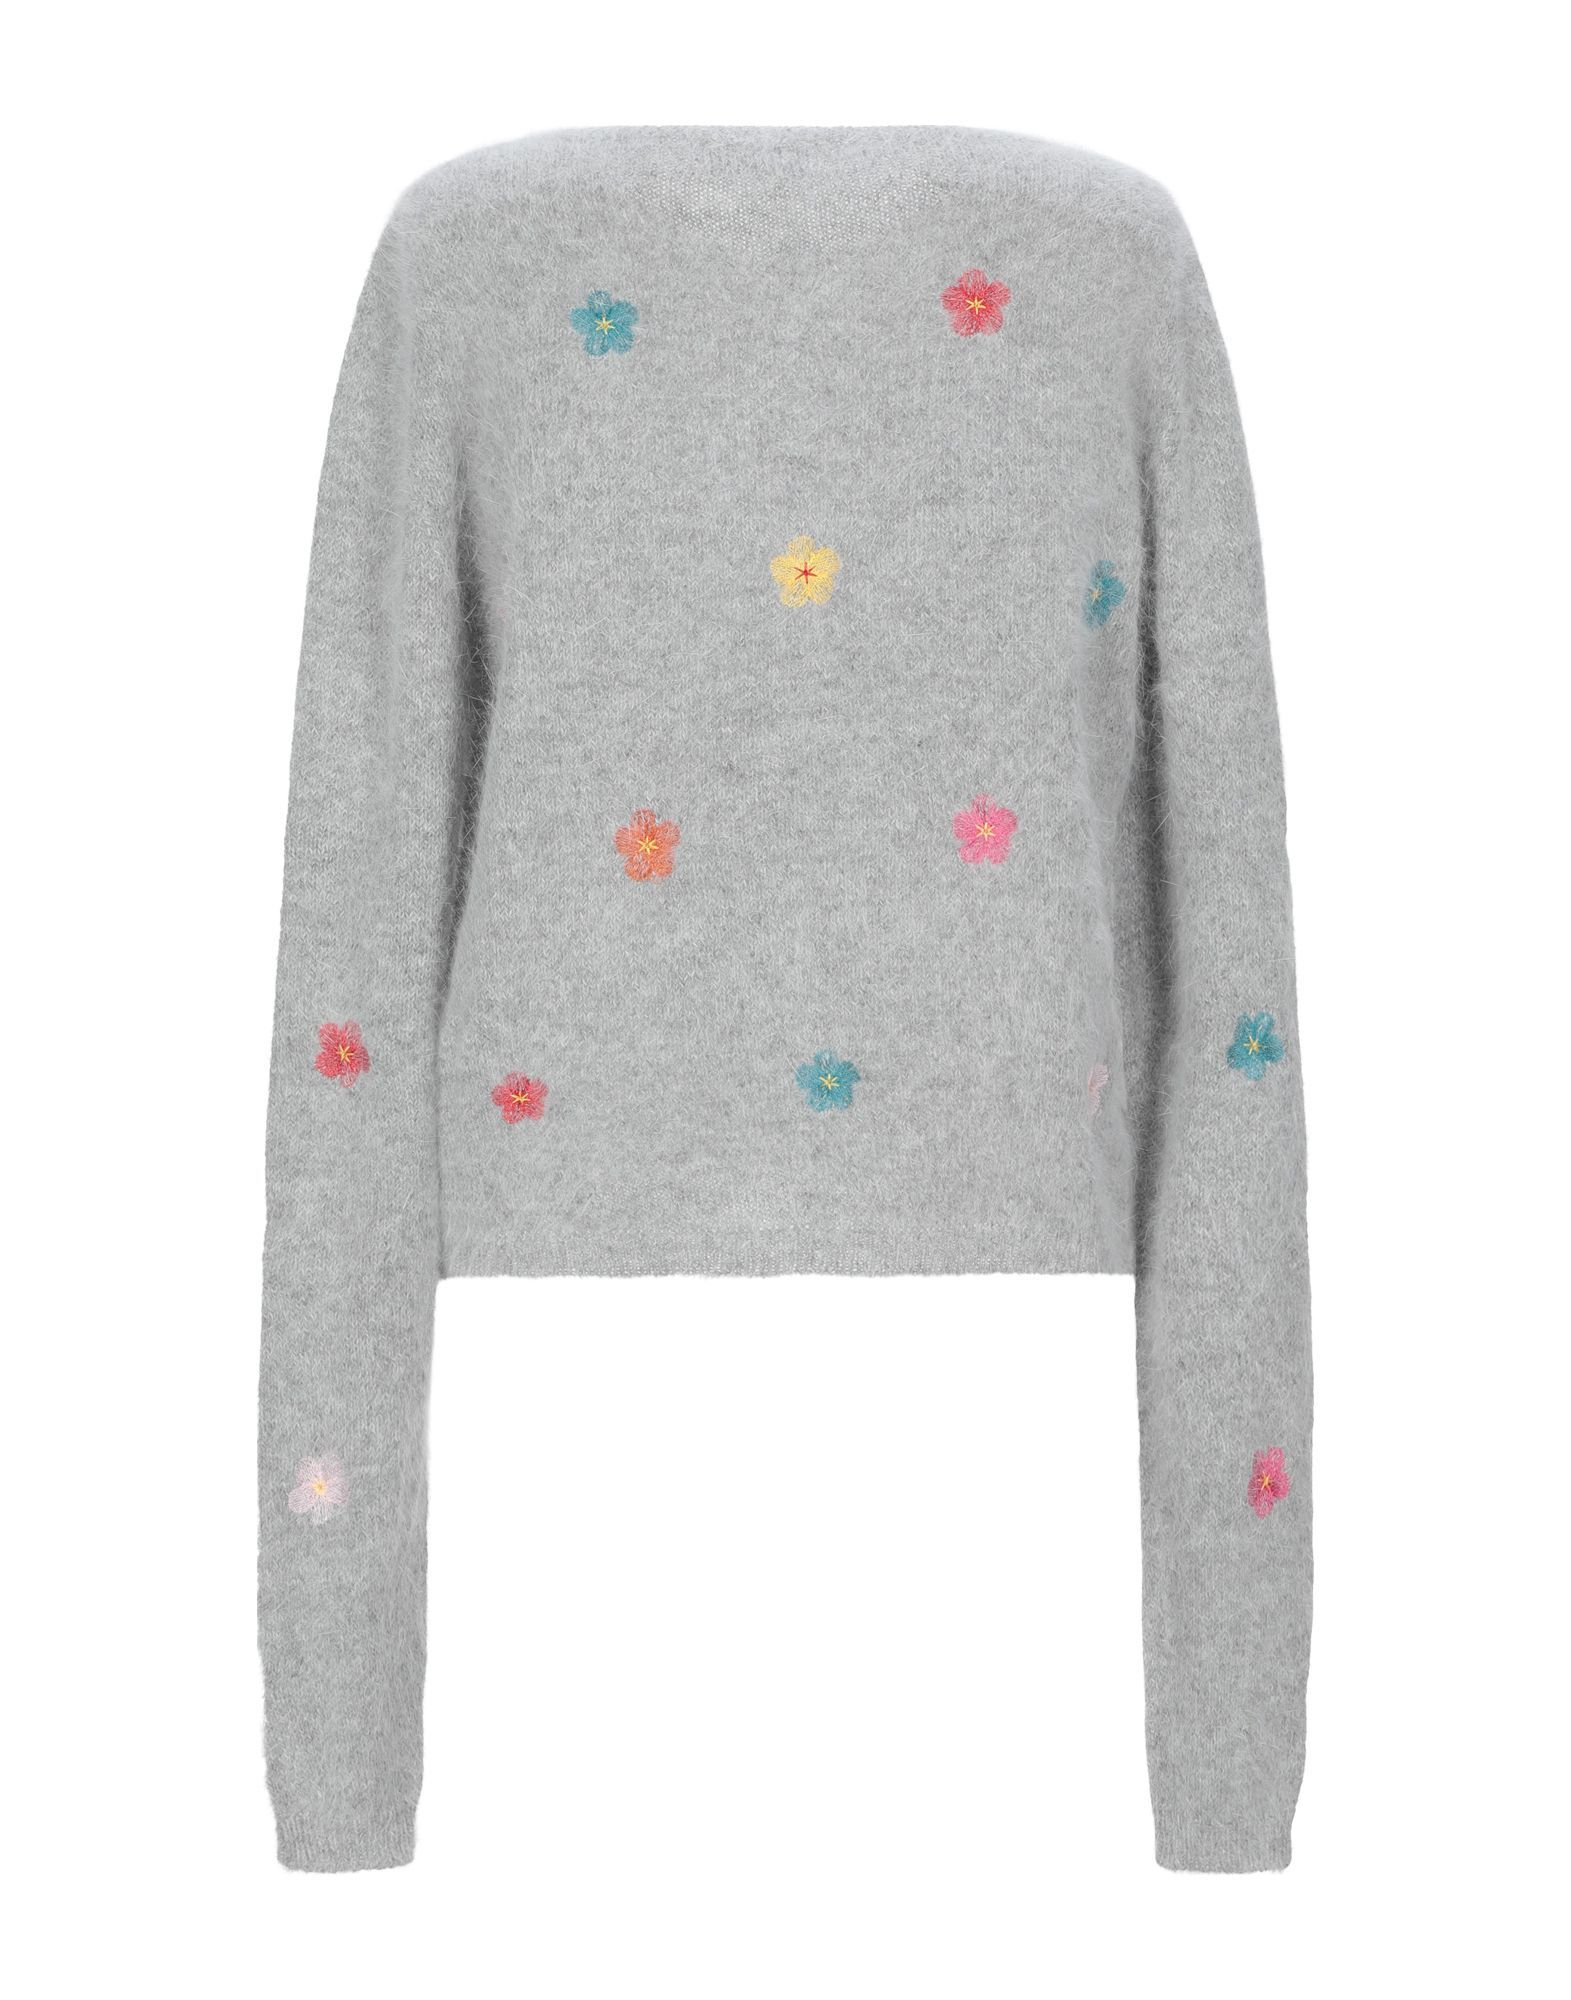 Roberto Collina Light Grey Angora Knit Cardigan